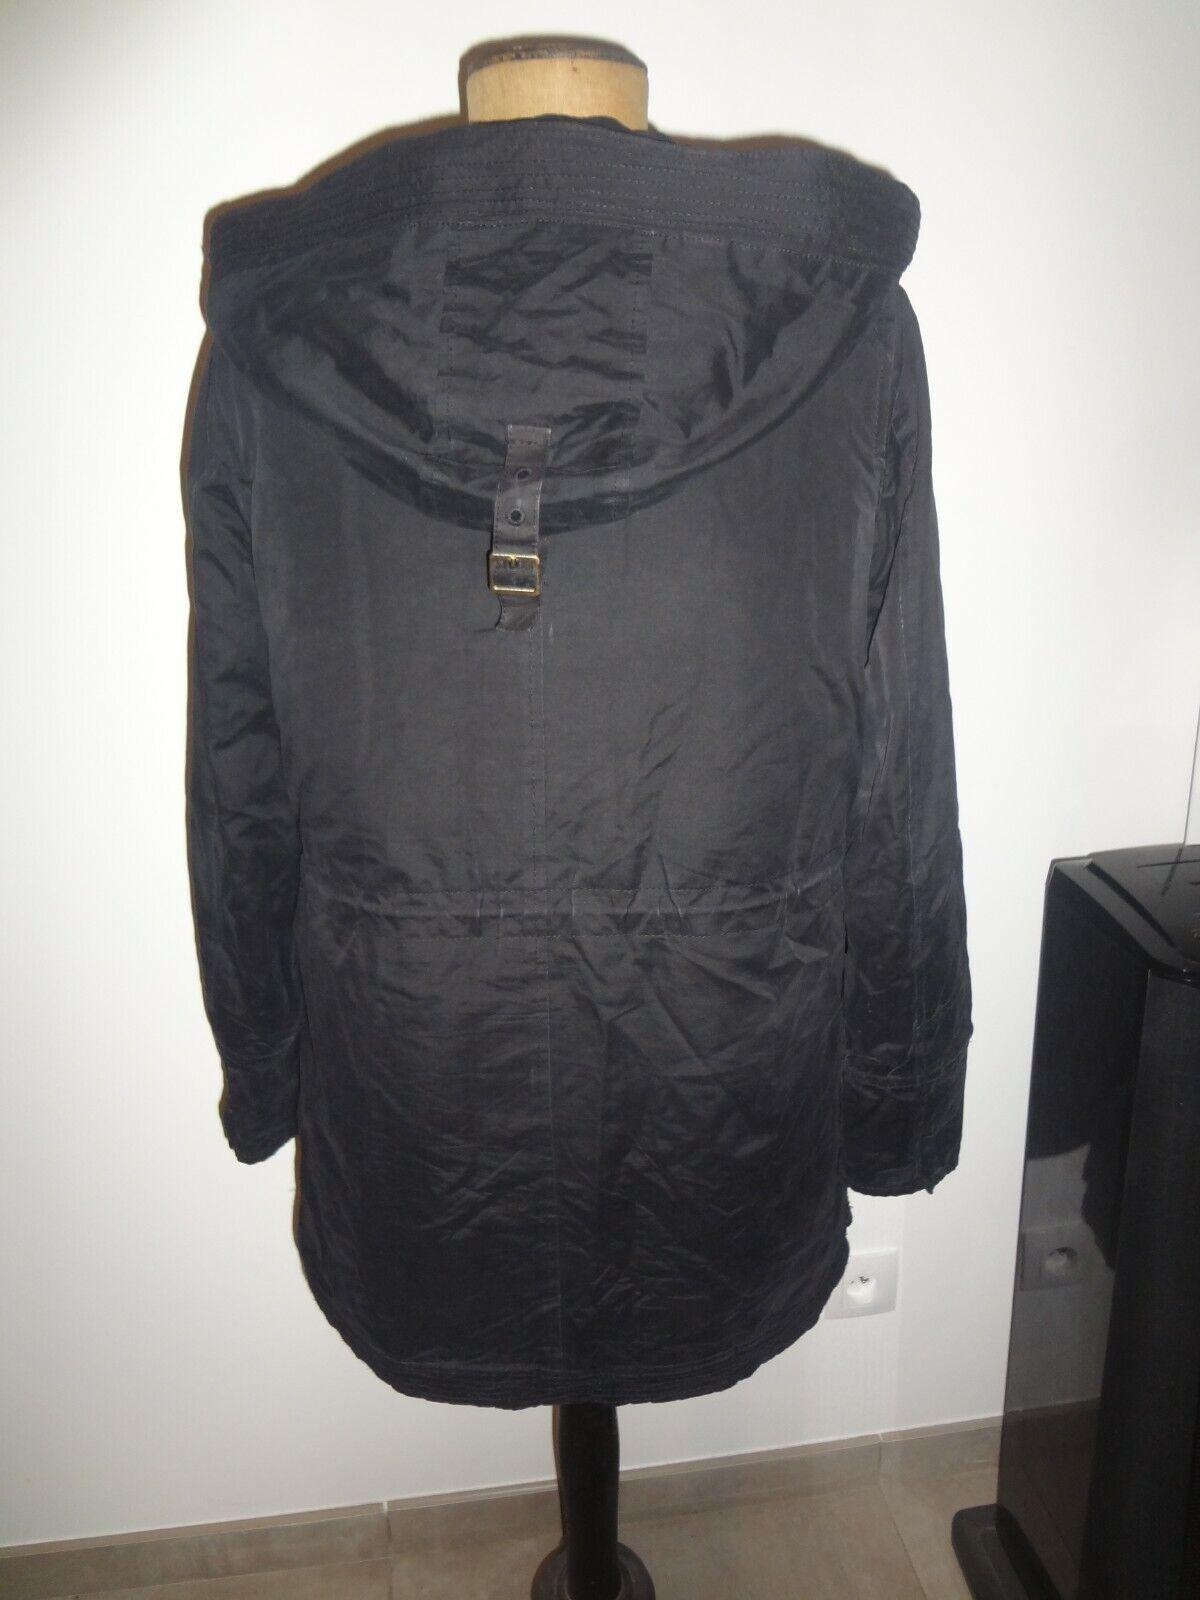 Zara trafaluc 50 52 parka manteau doudoune capuche amovible veste blouson trench